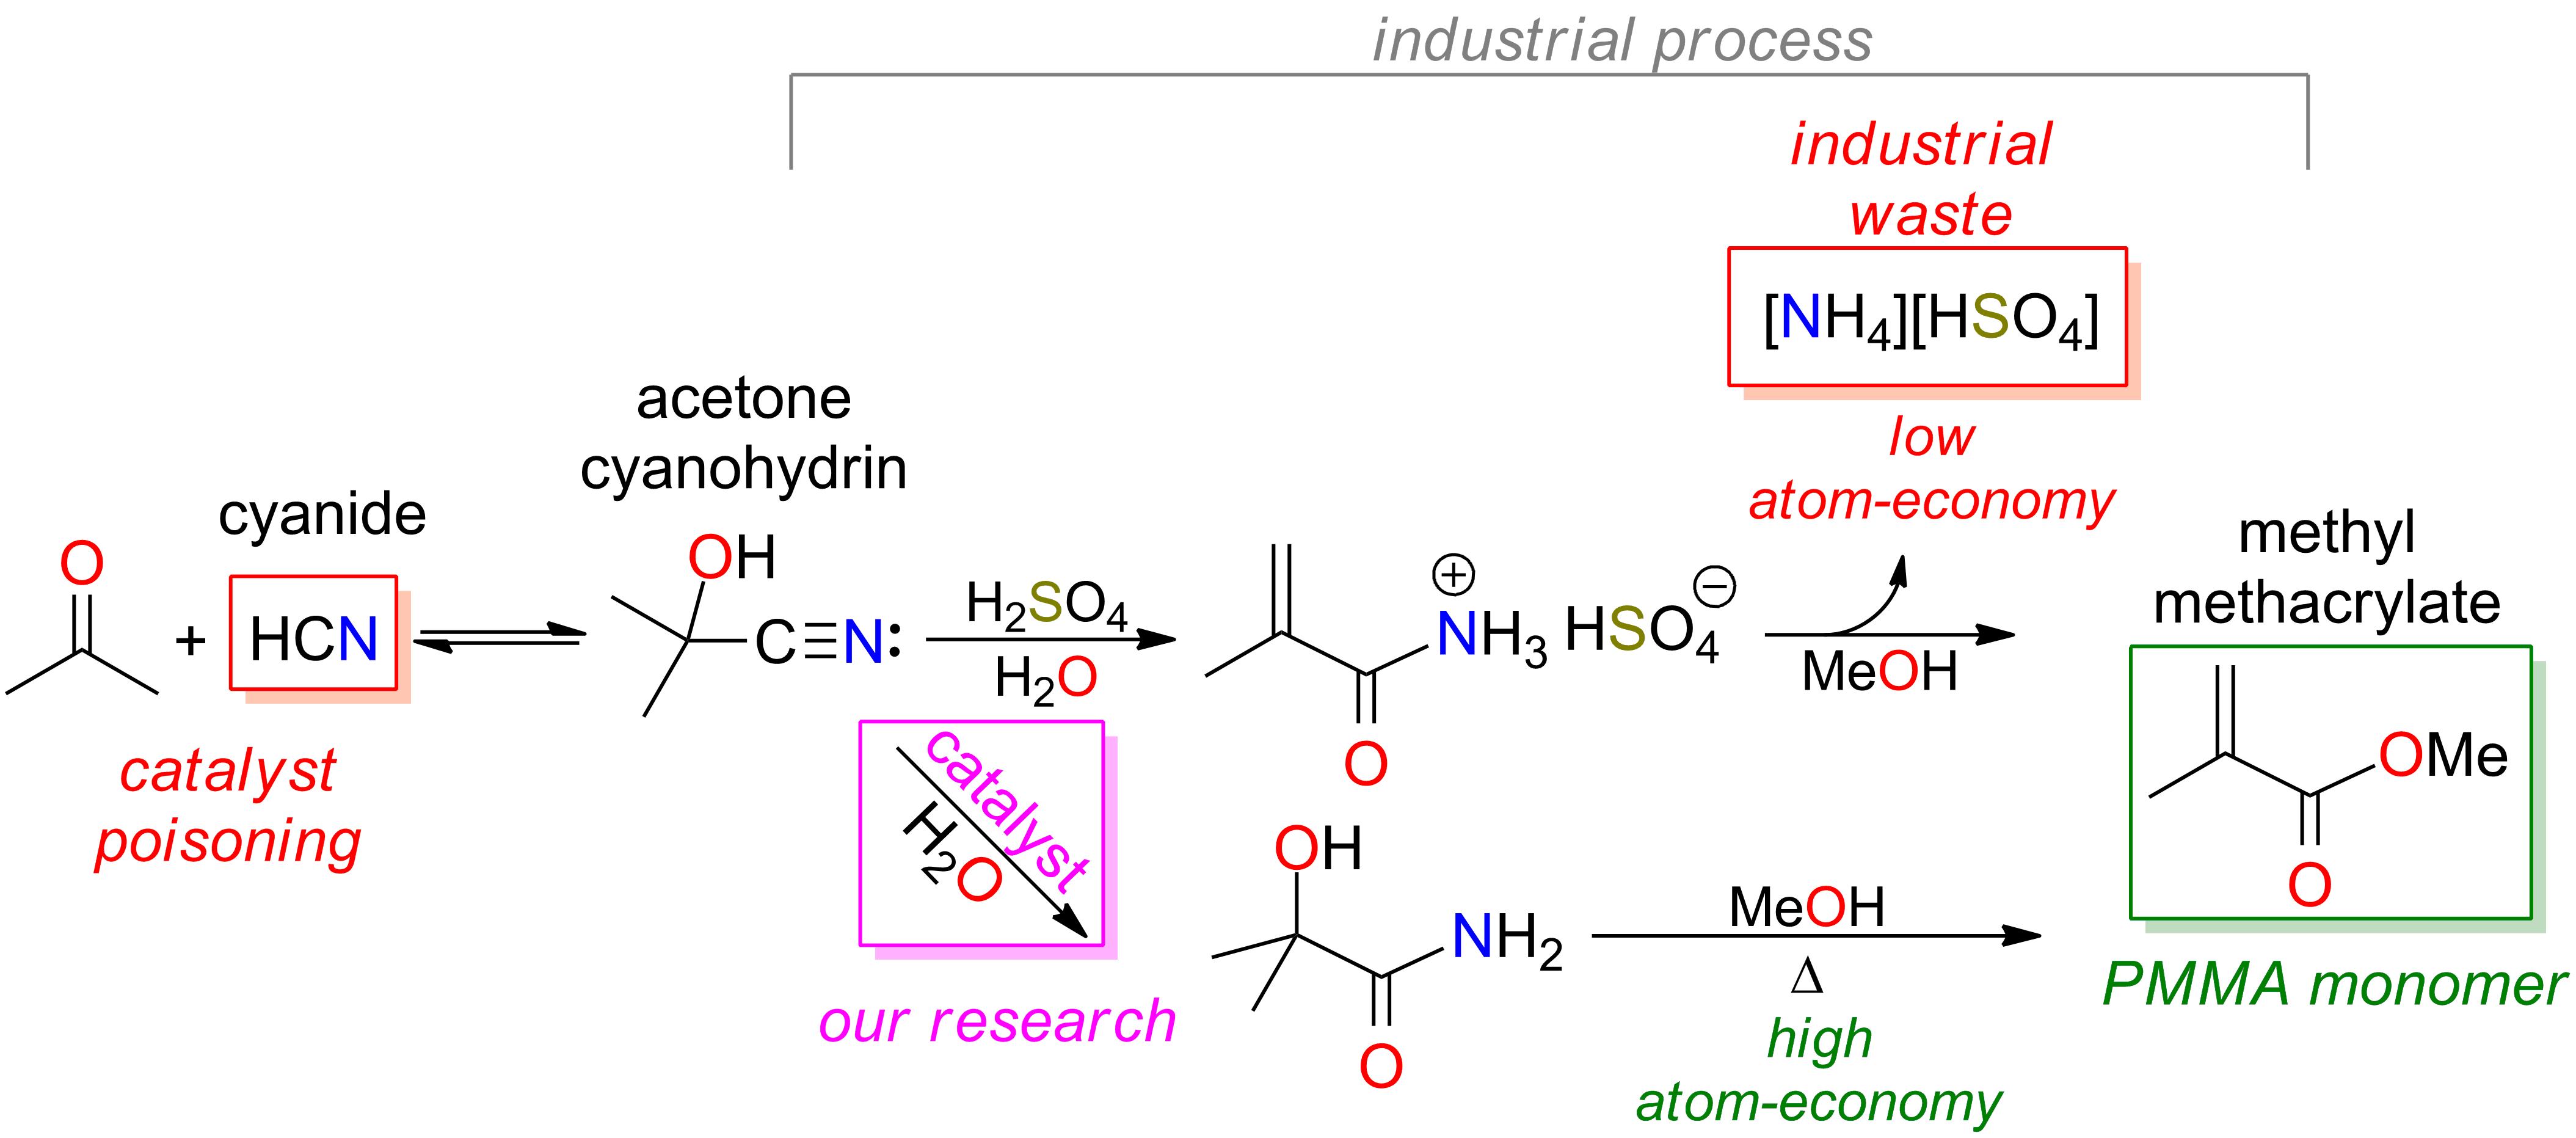 acetone cyanohydrin